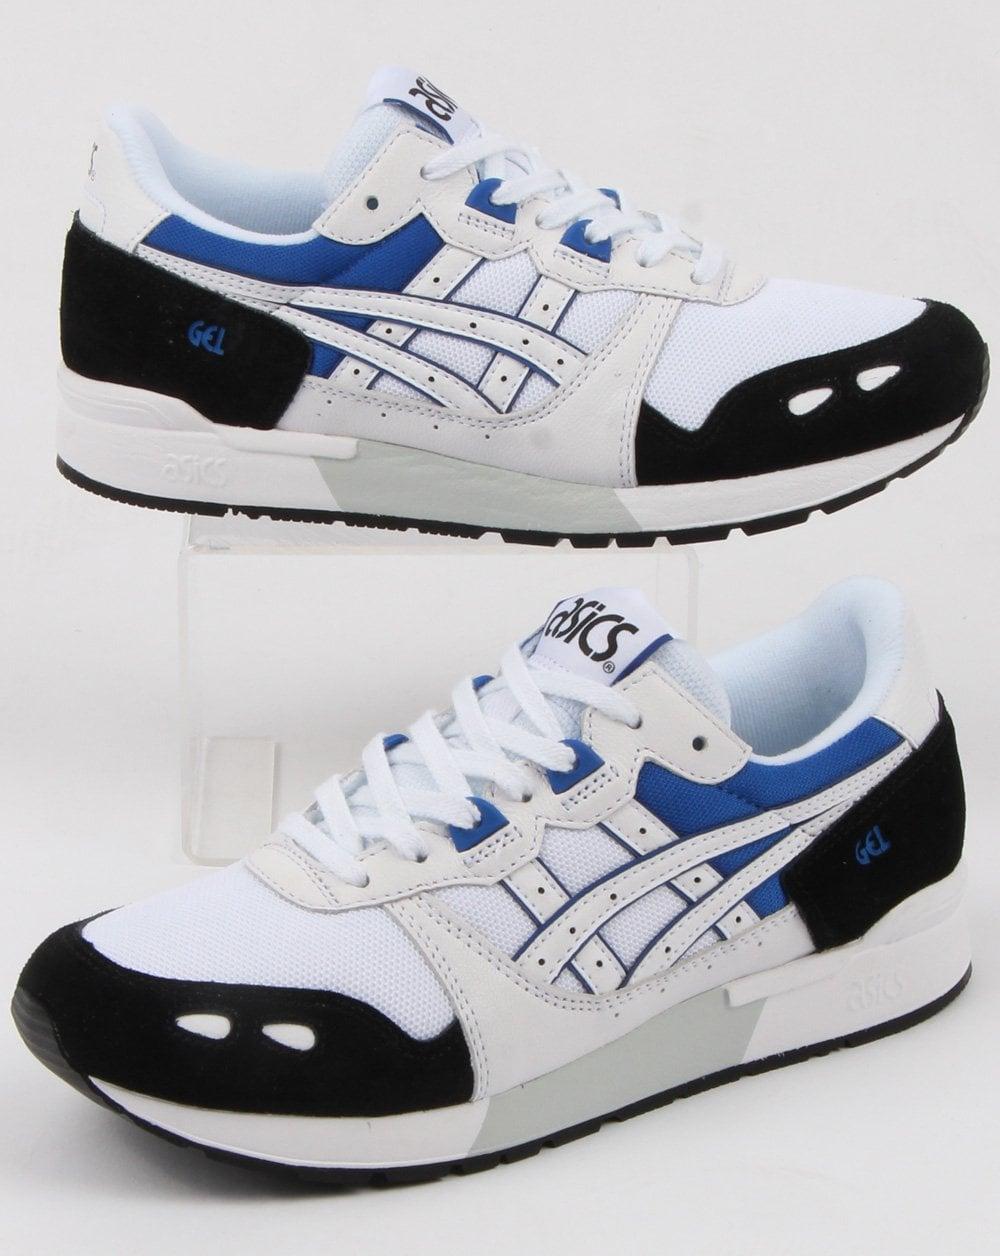 Asics Gel-lyte Trainers White/blue